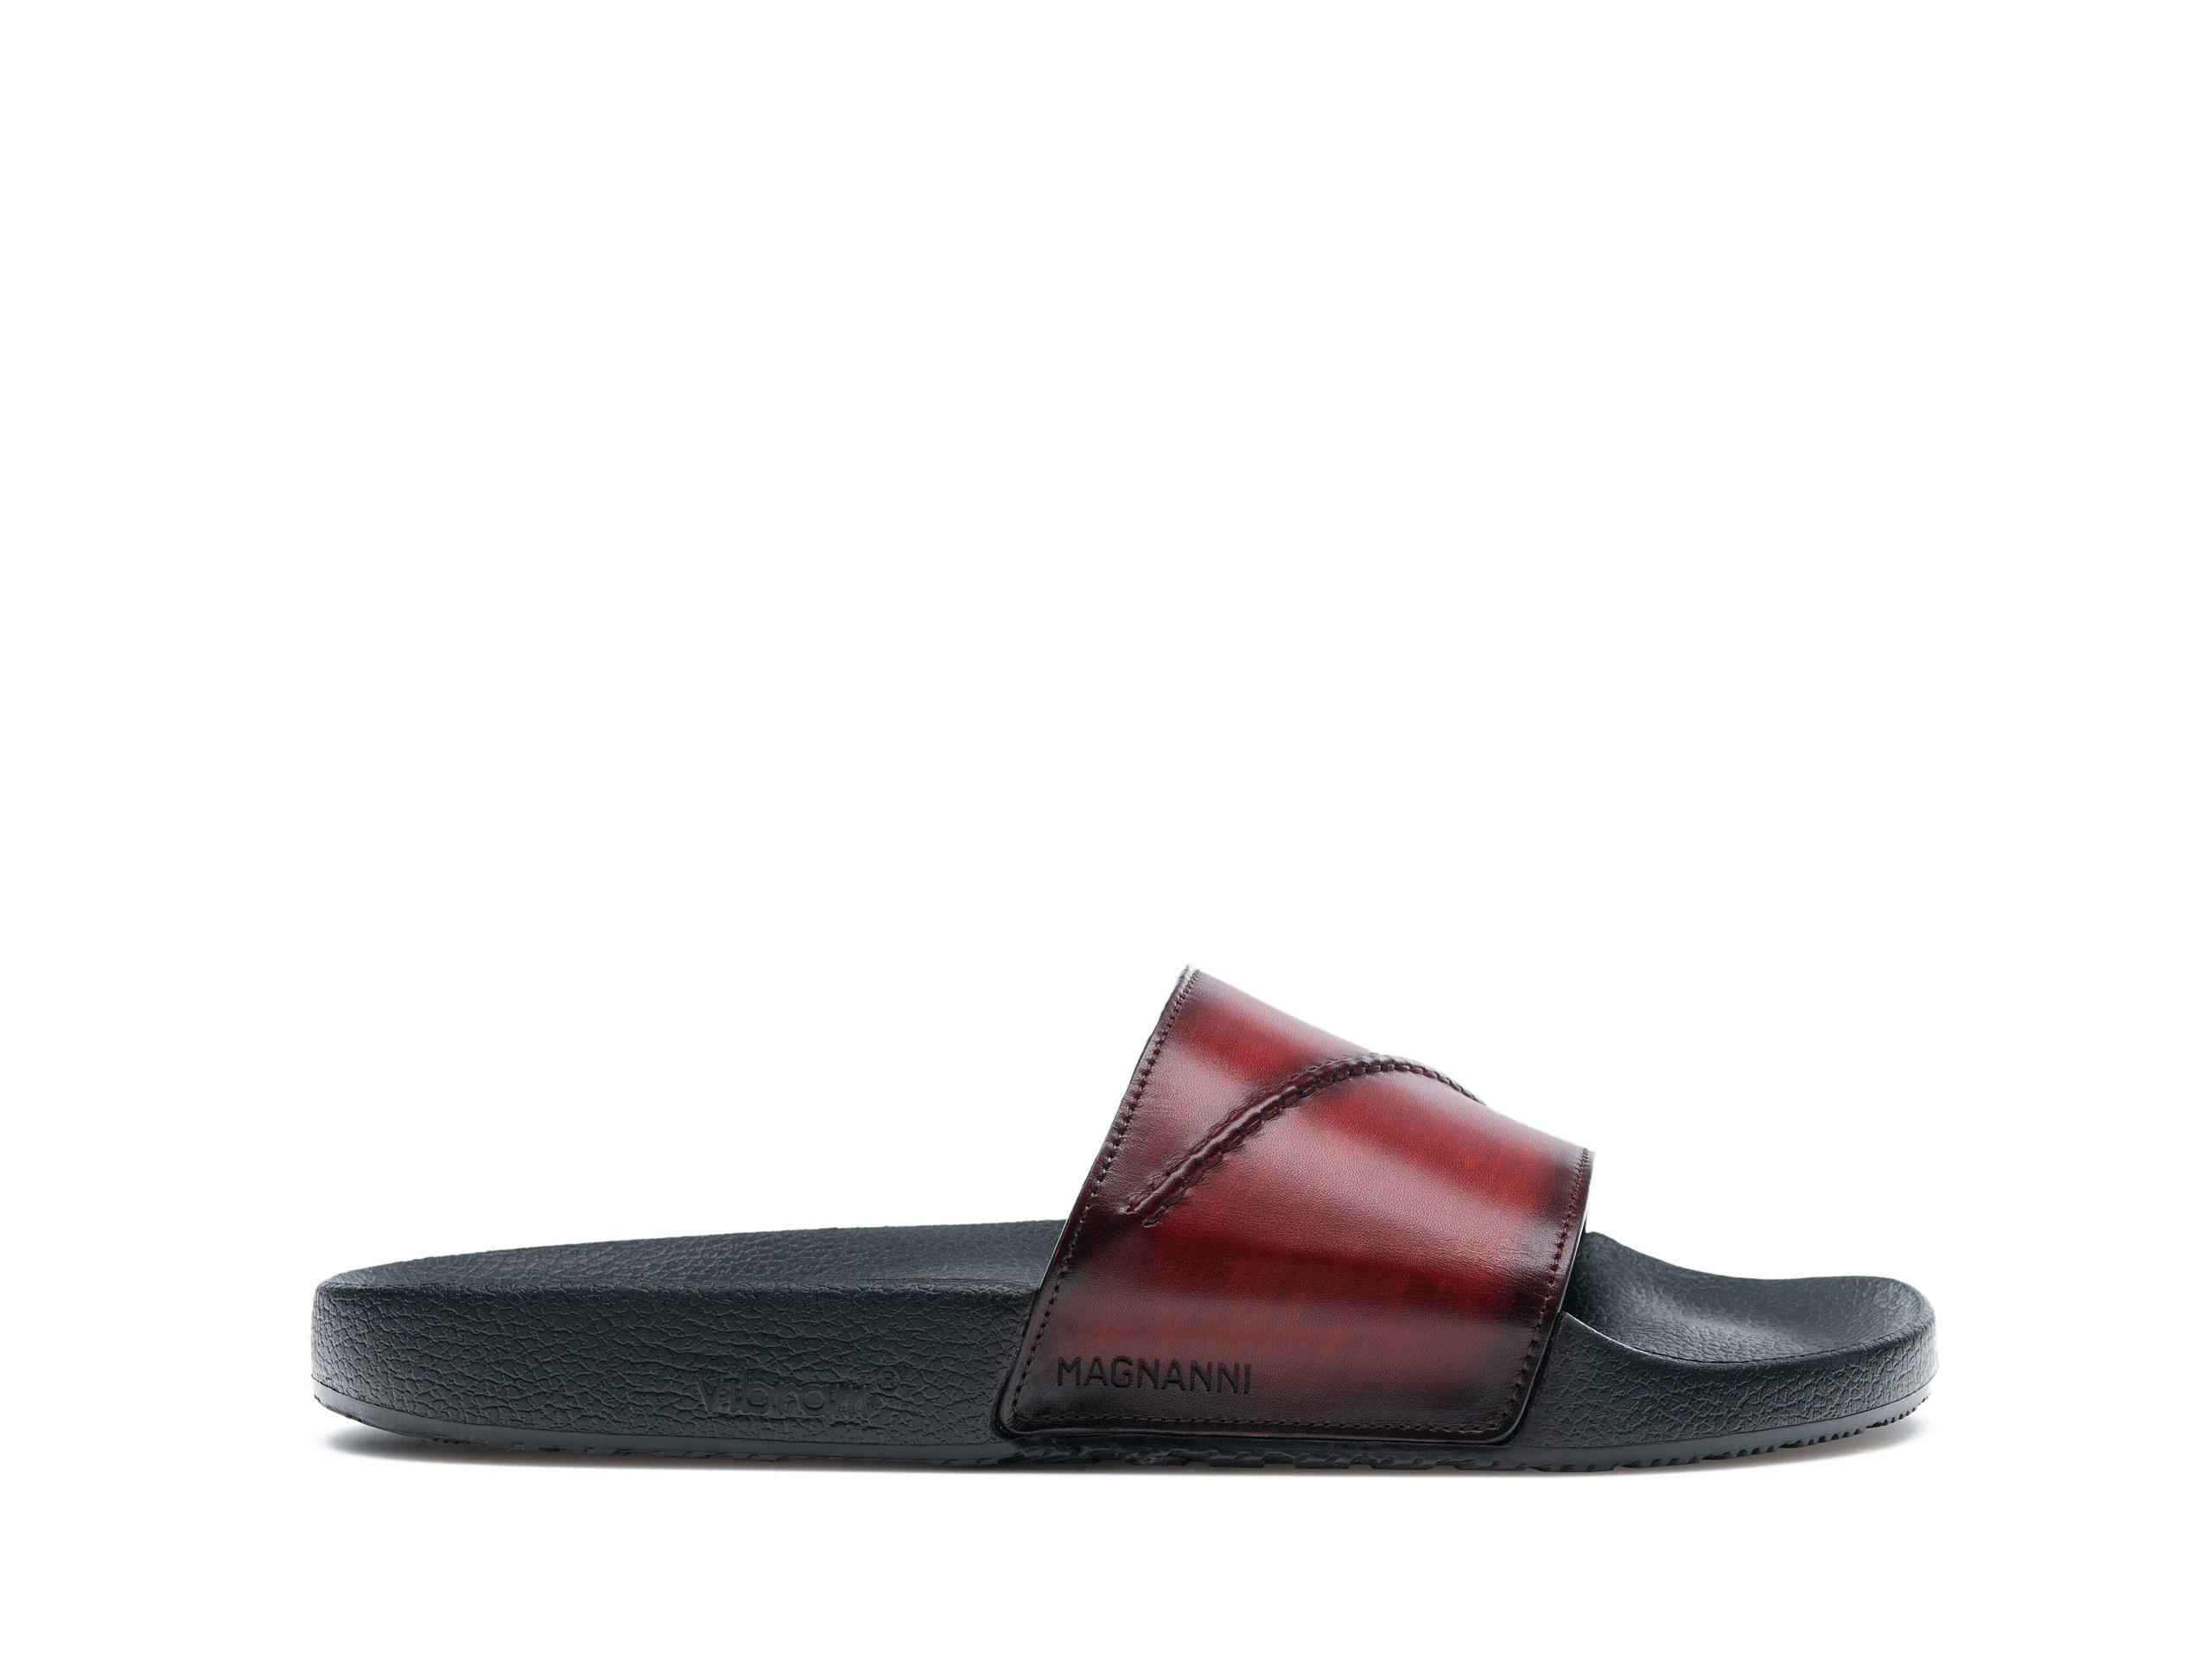 Magnanni Playa Stitch Red Shoes